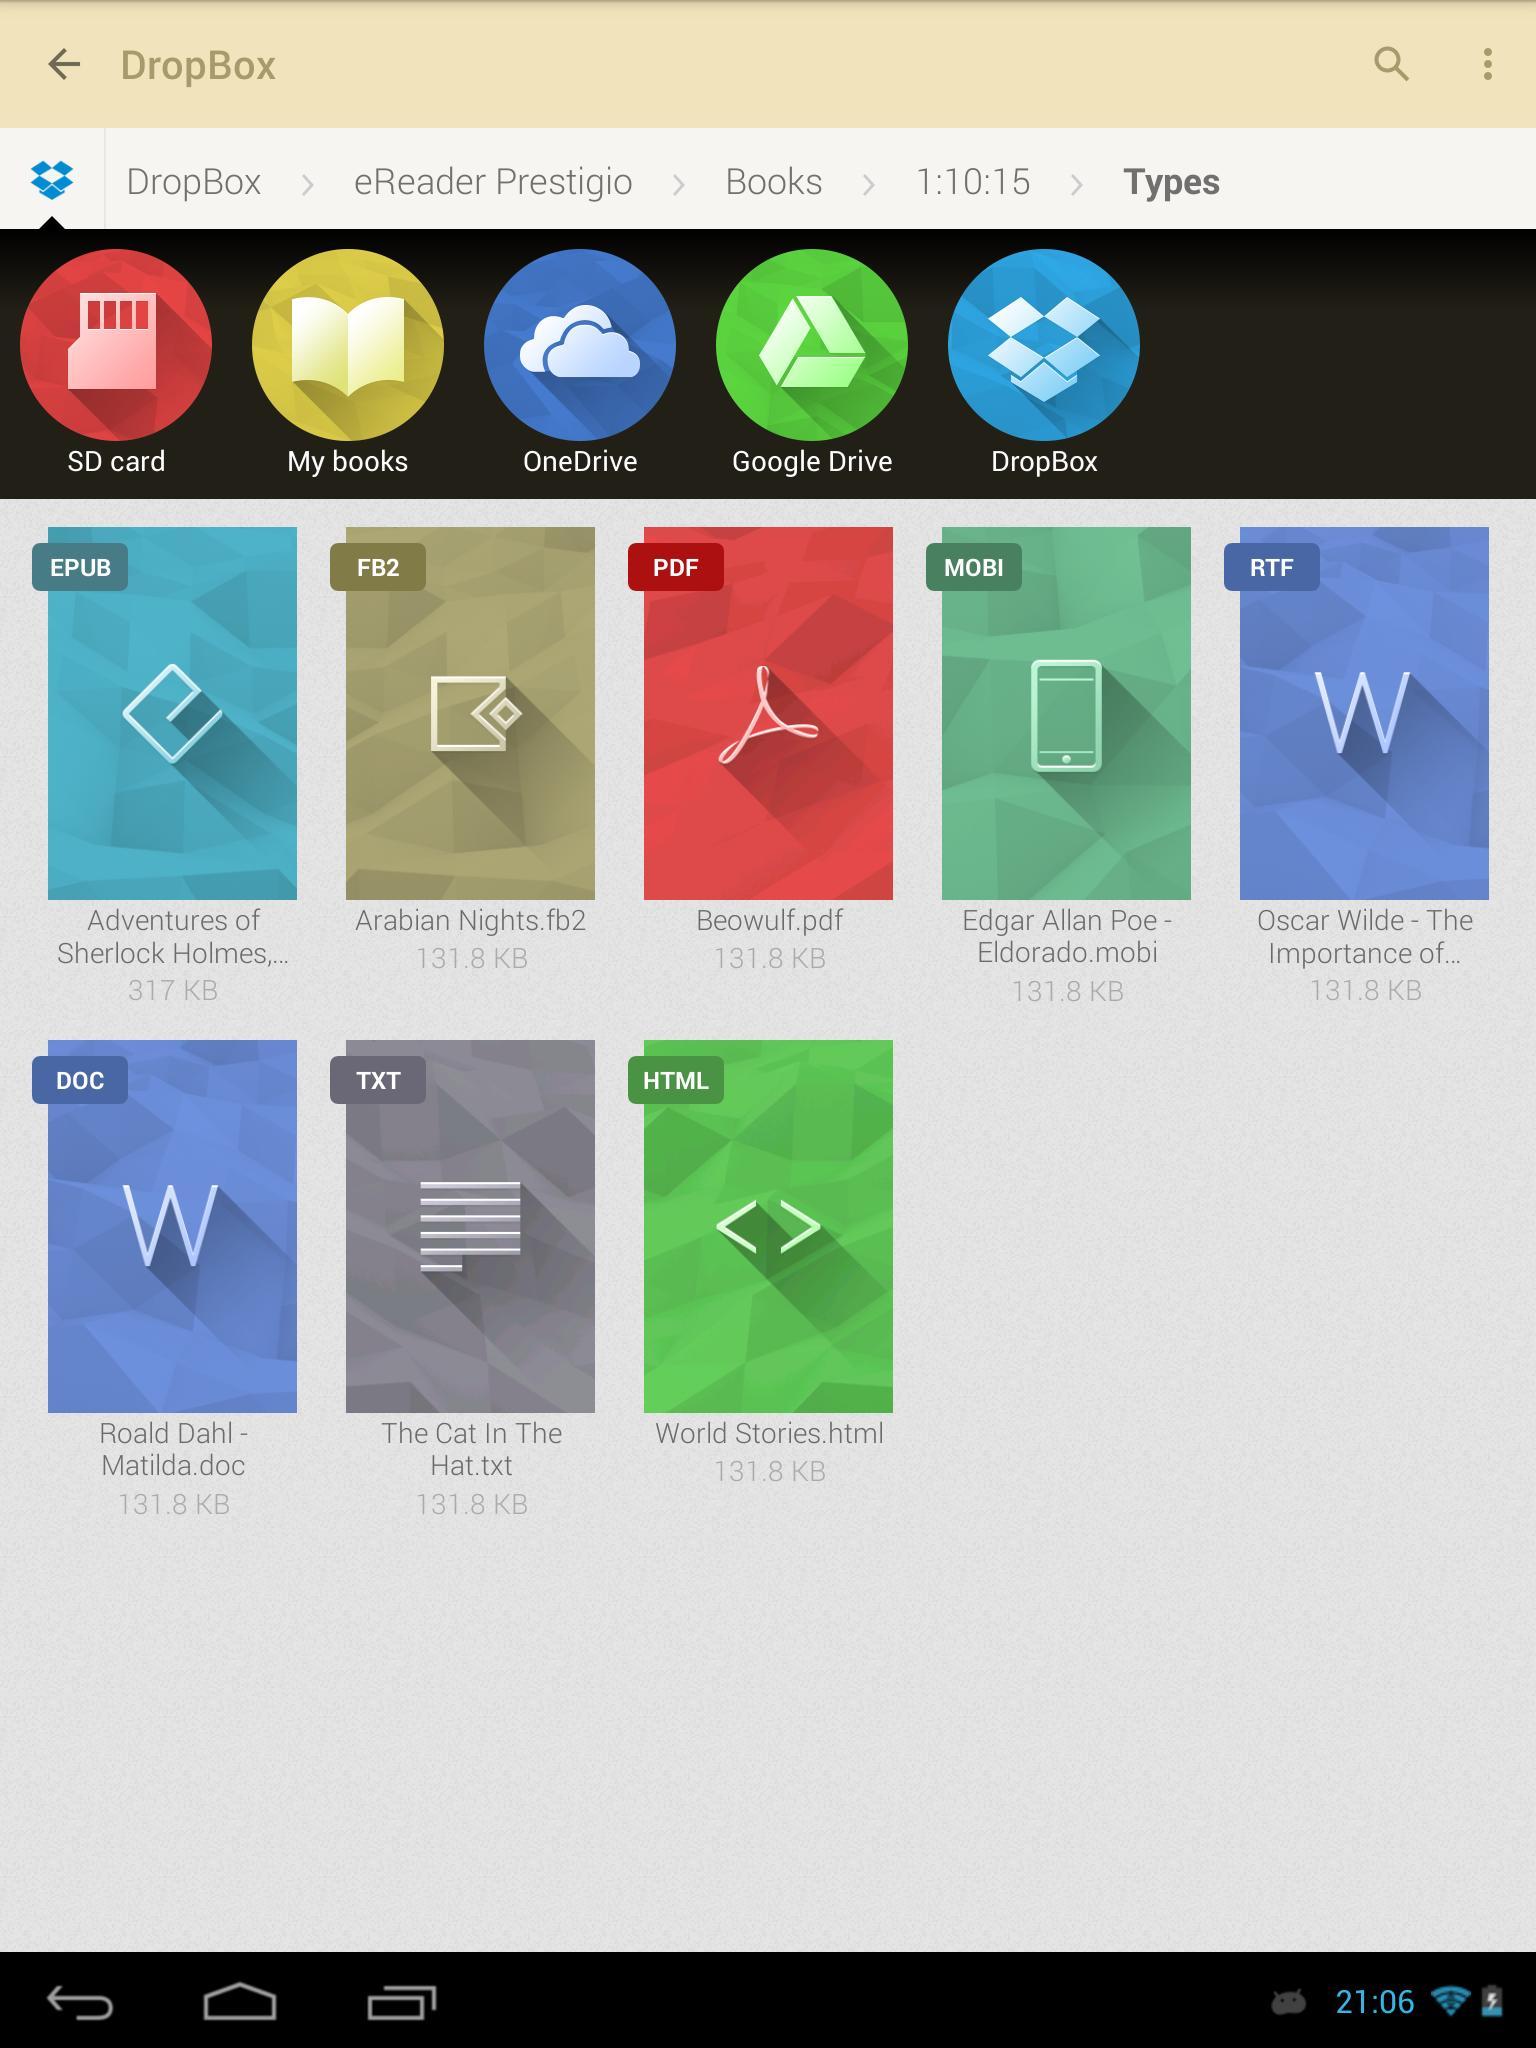 eReader Prestigio Book Reader 6.3.0 Screenshot 18